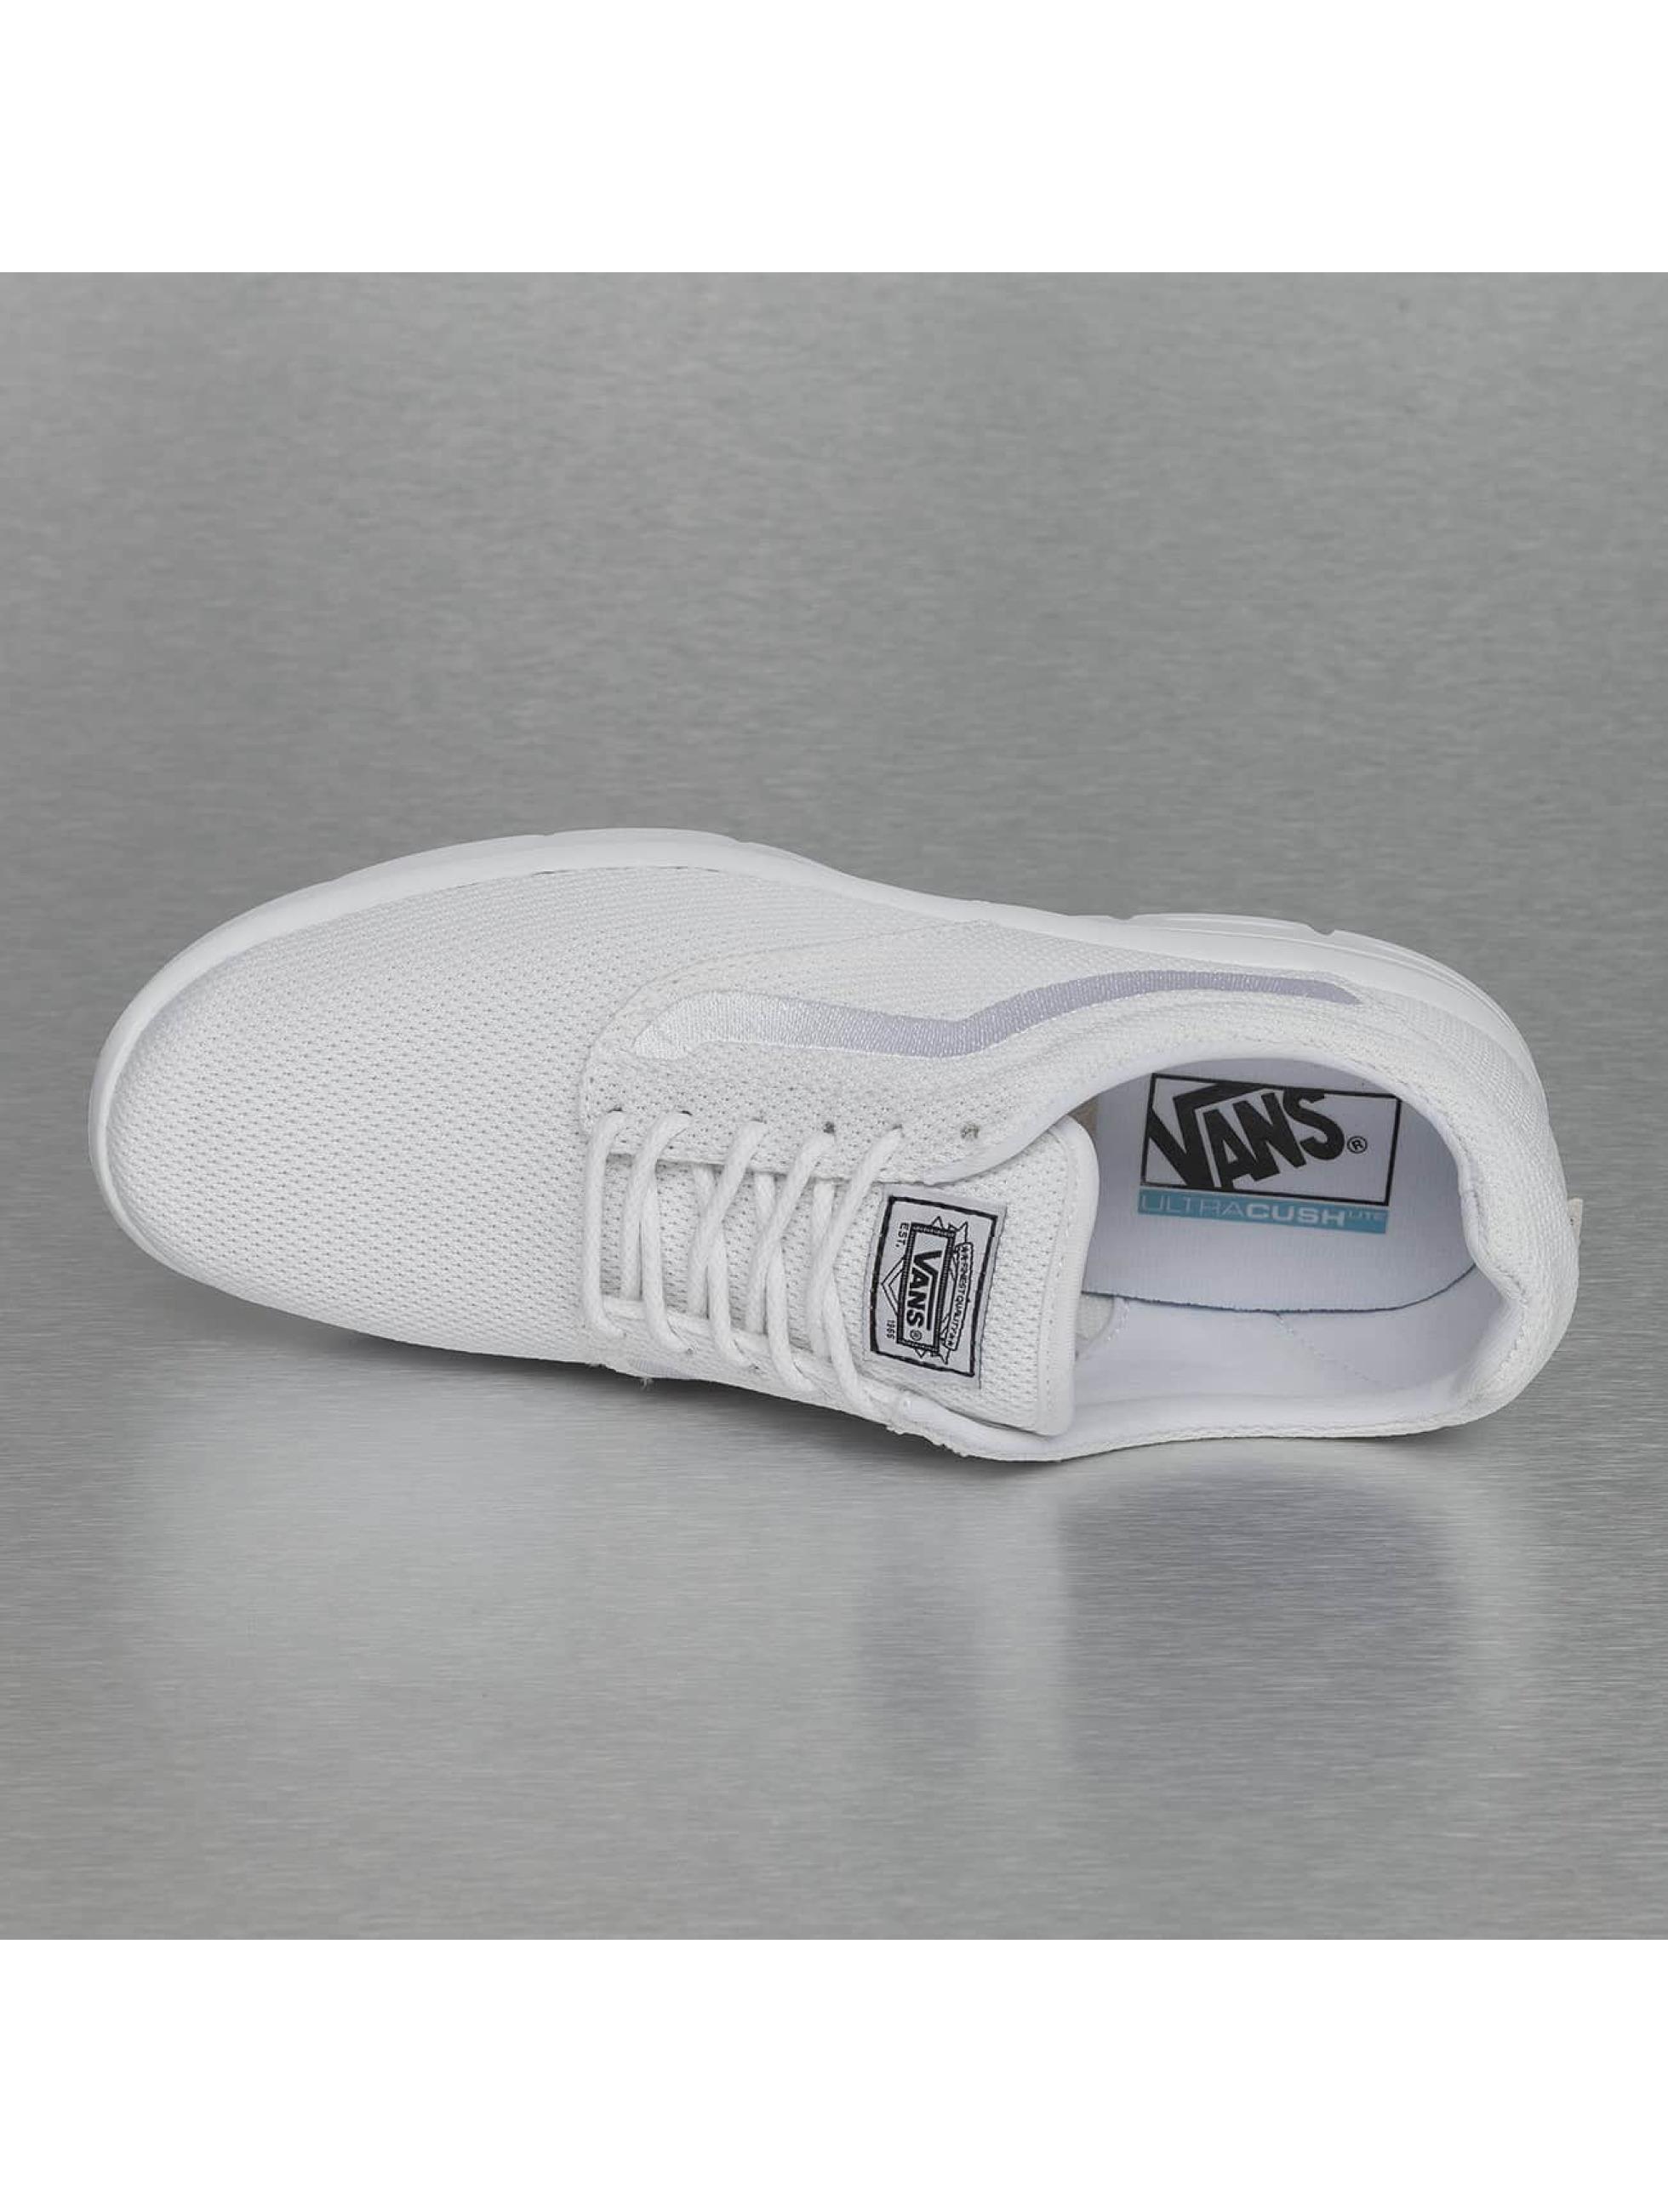 Vans Baskets Iso 1.5 blanc